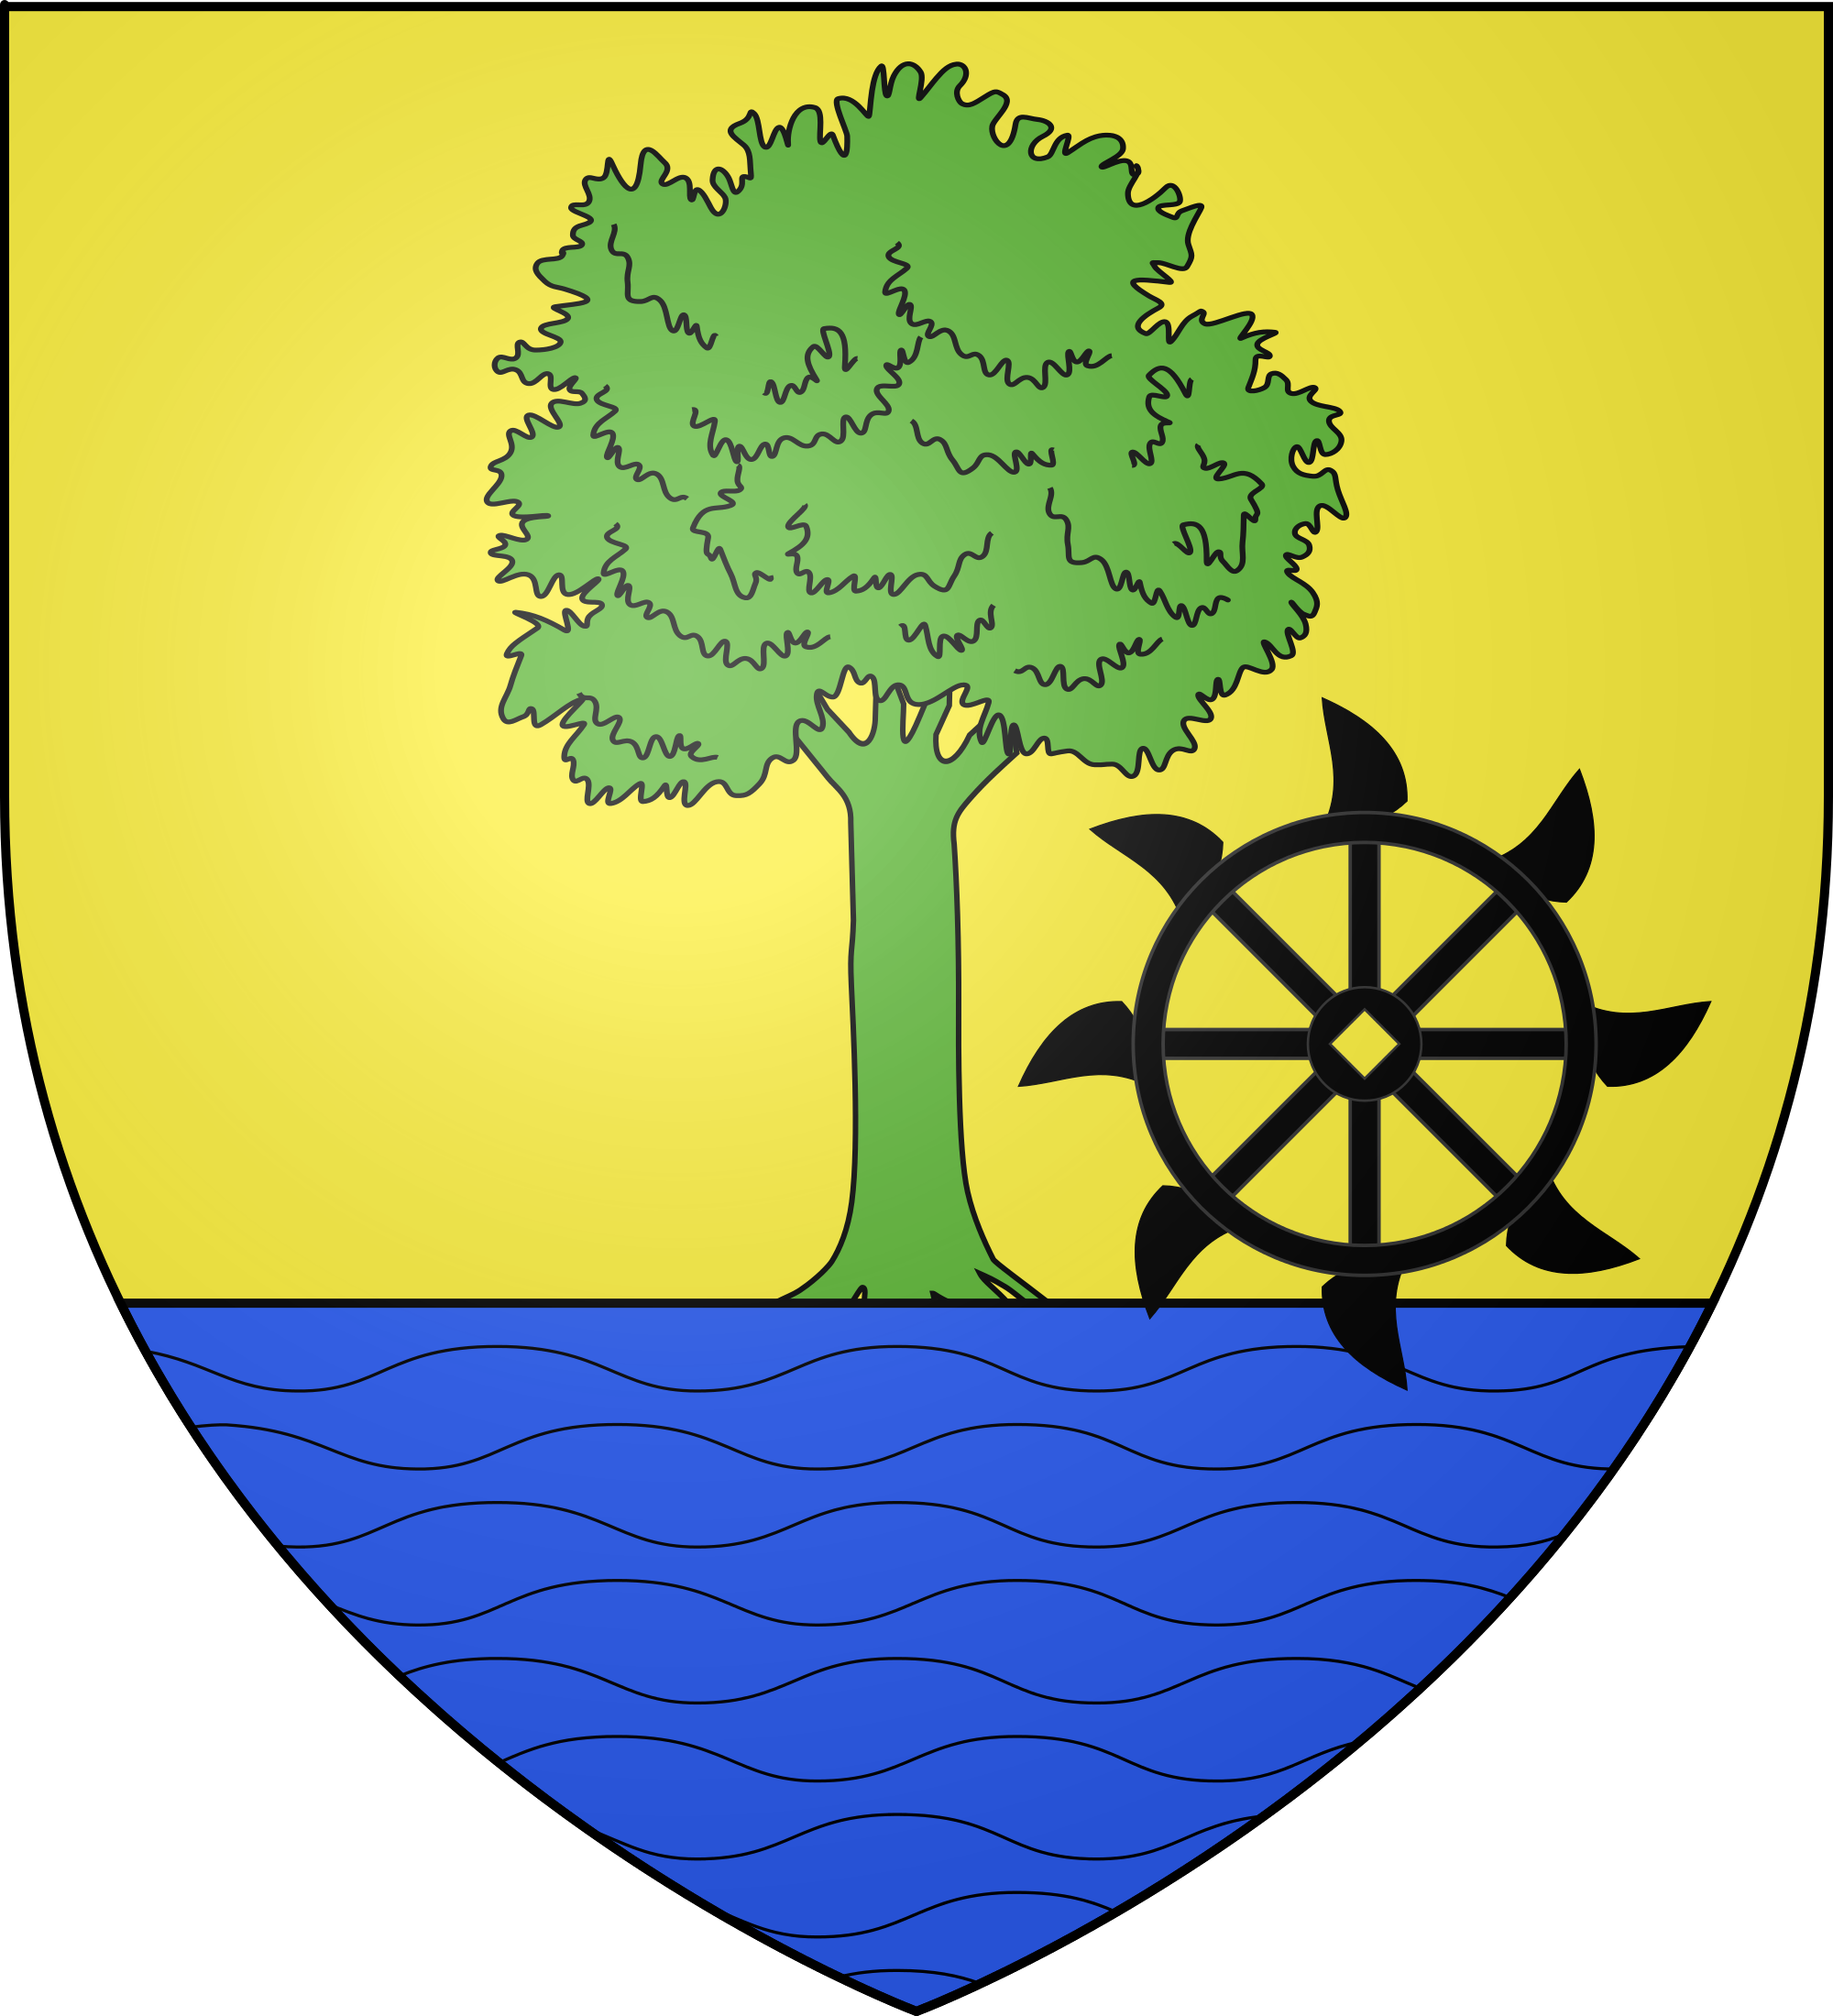 File:Blason ville fr Noyers (Loiret).svg.